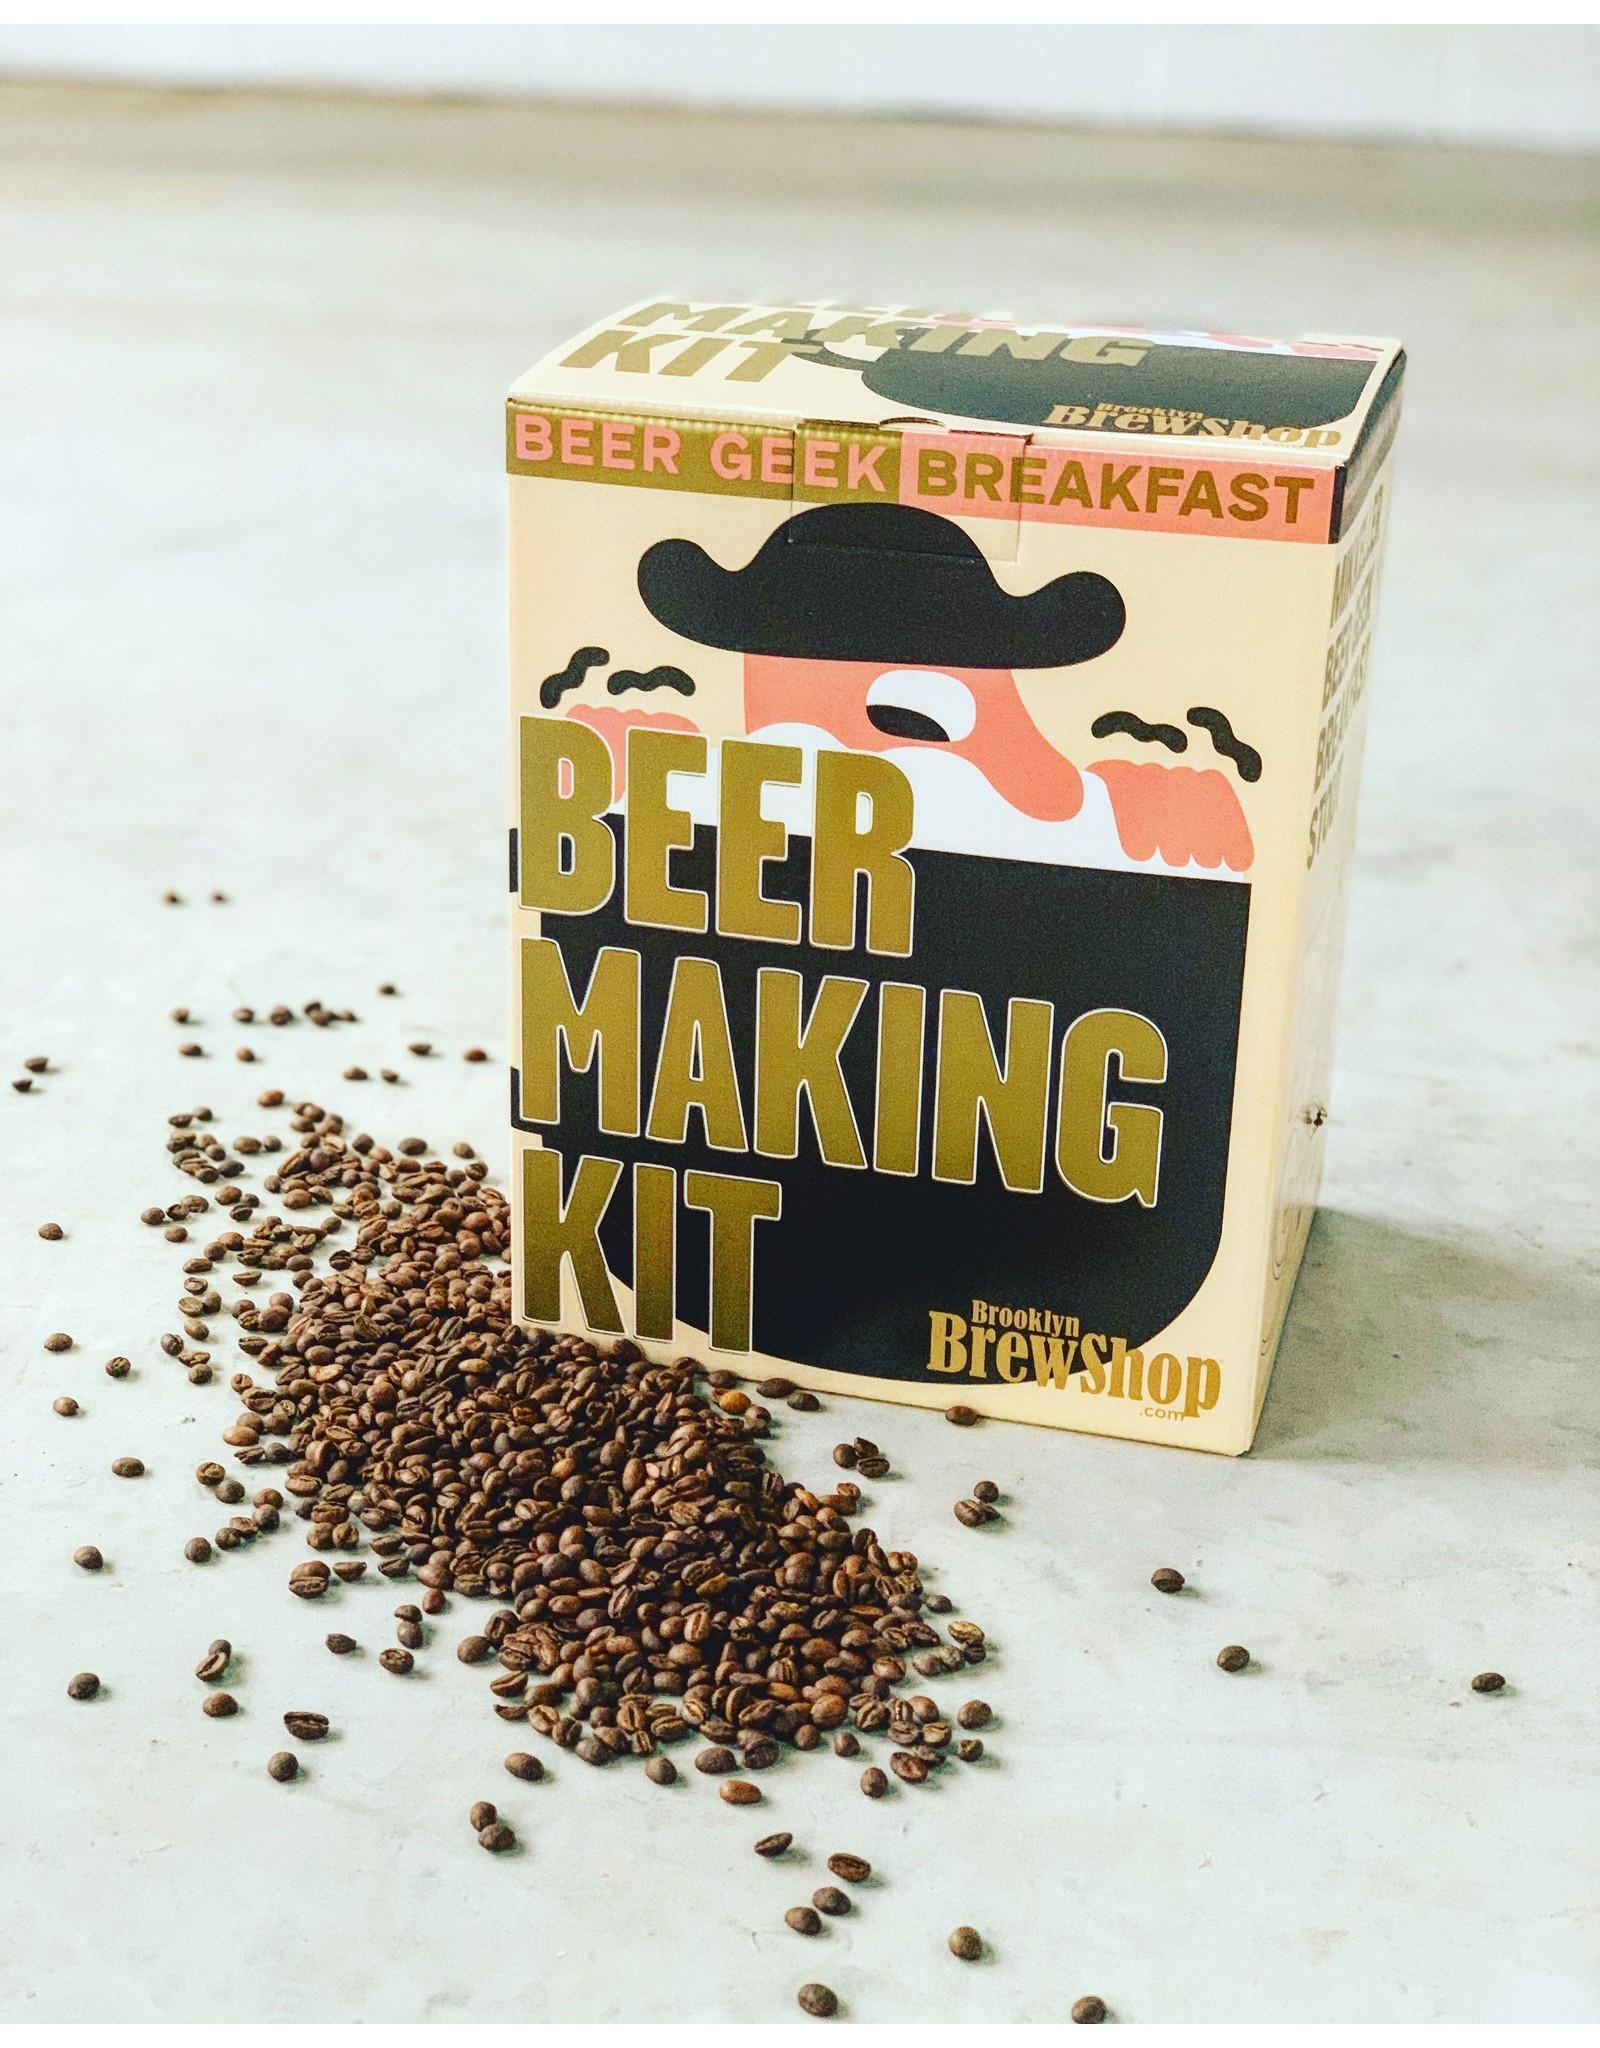 Brooklyn Brew Shop Mikkeller Beer Making Kit